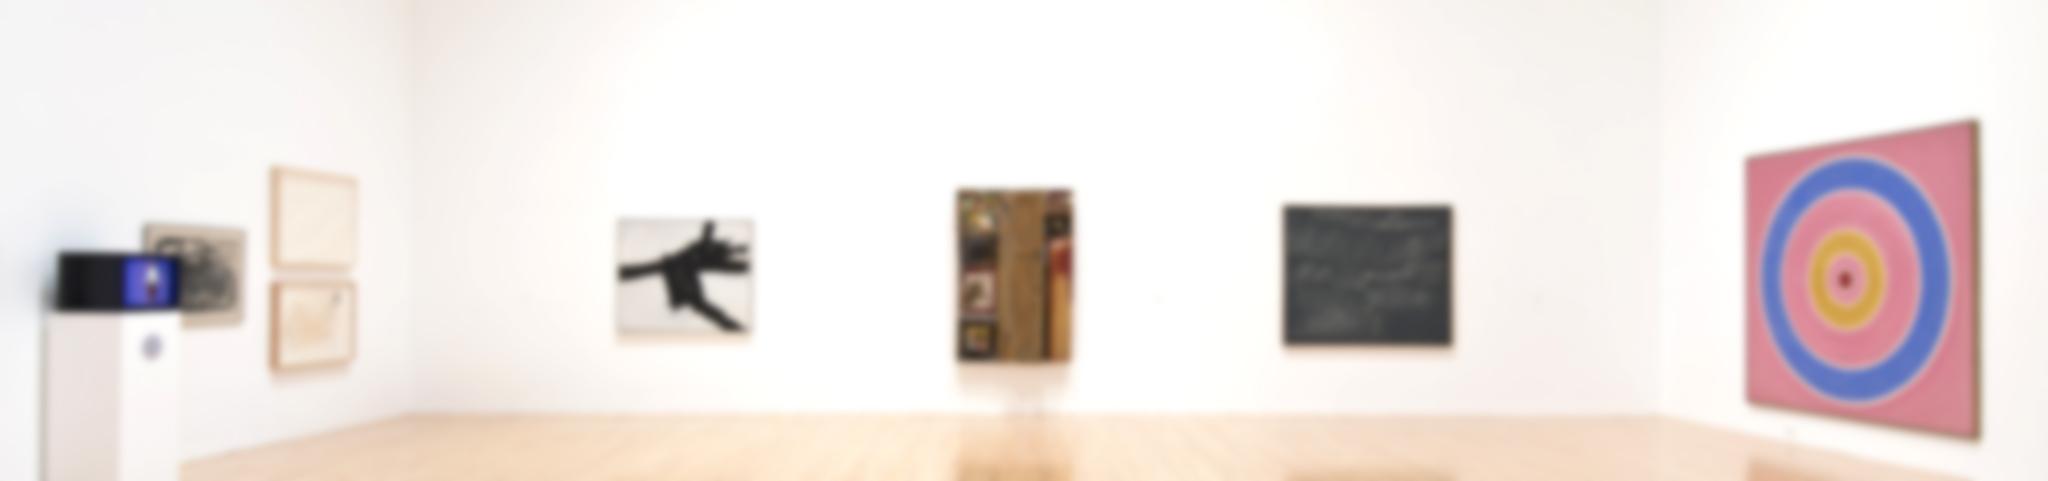 Stock Gallery Image_blur.jpg